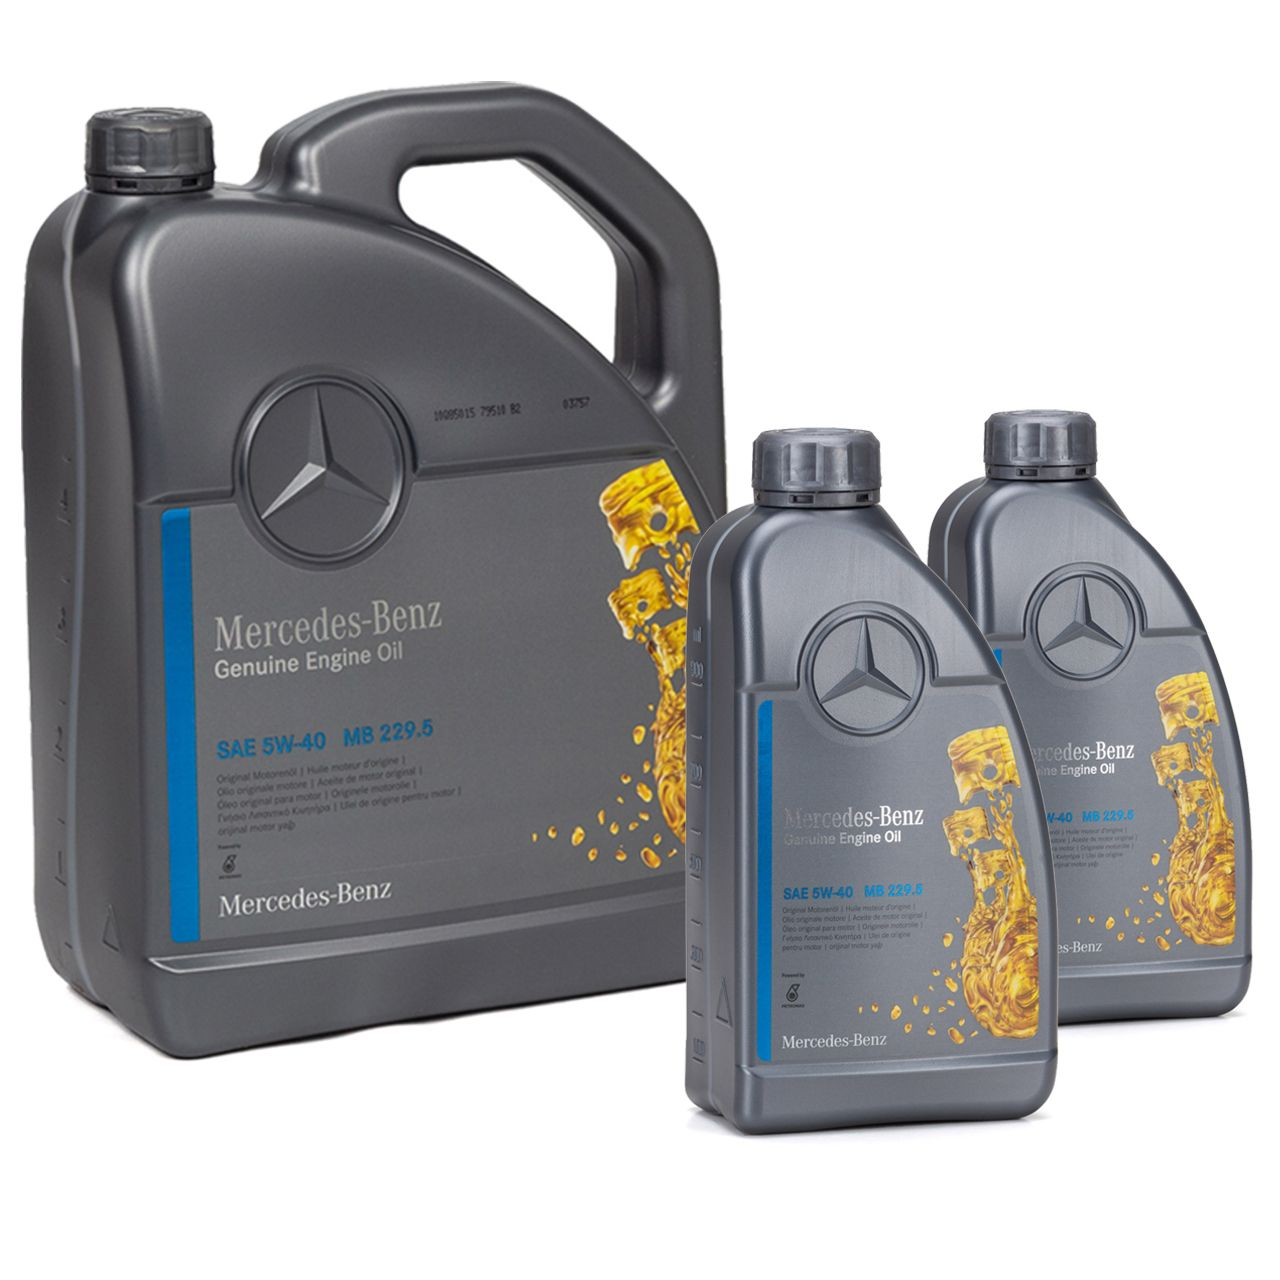 7L 7 Liter ORIGINAL Mercedes-Benz Motoröl ÖL 5W40 5W-40 MB 229.5 0009899202